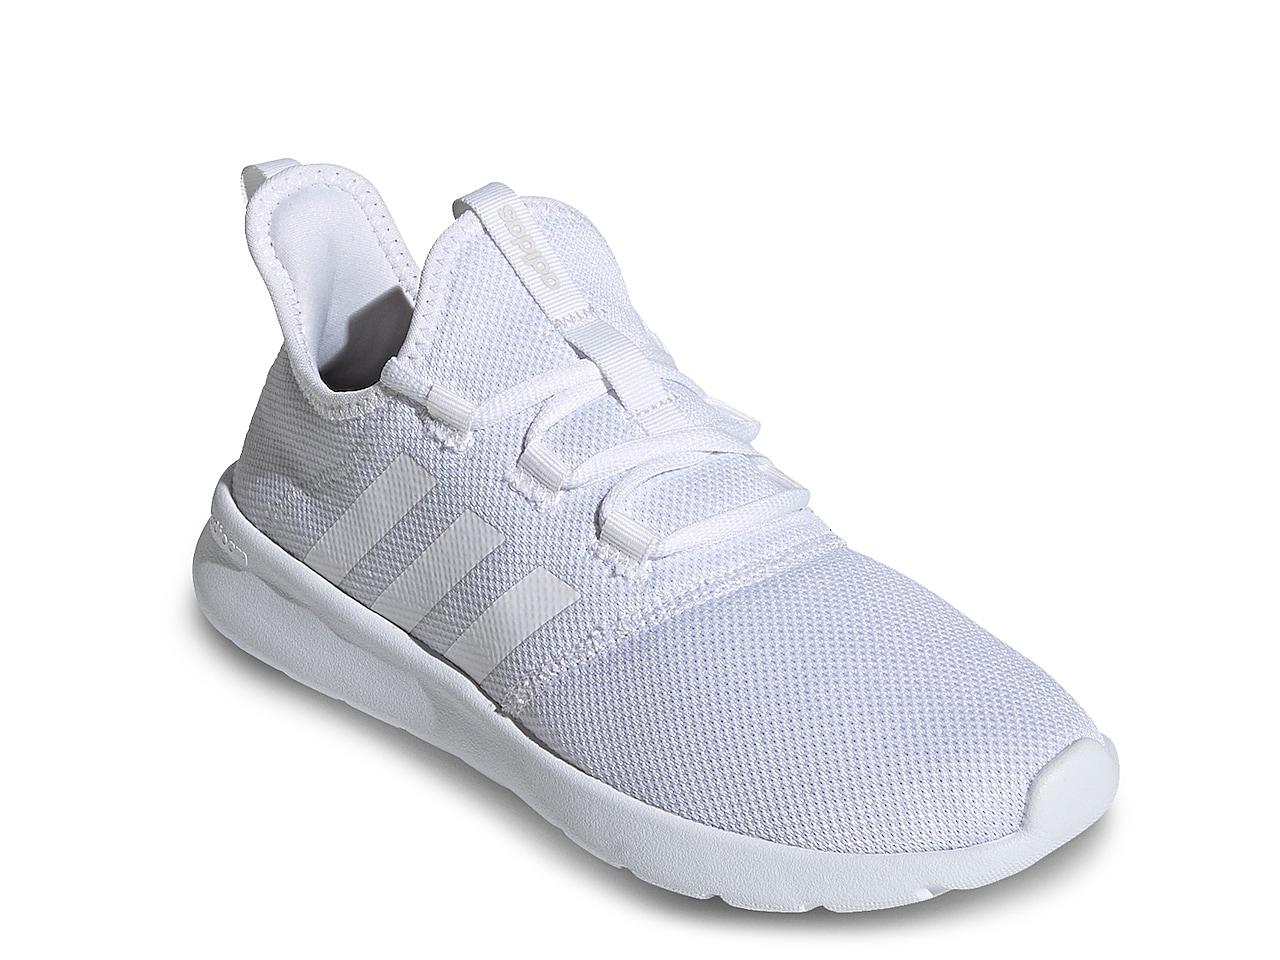 adidas Cloudfoam Pure 2.0 Sneaker - Women's